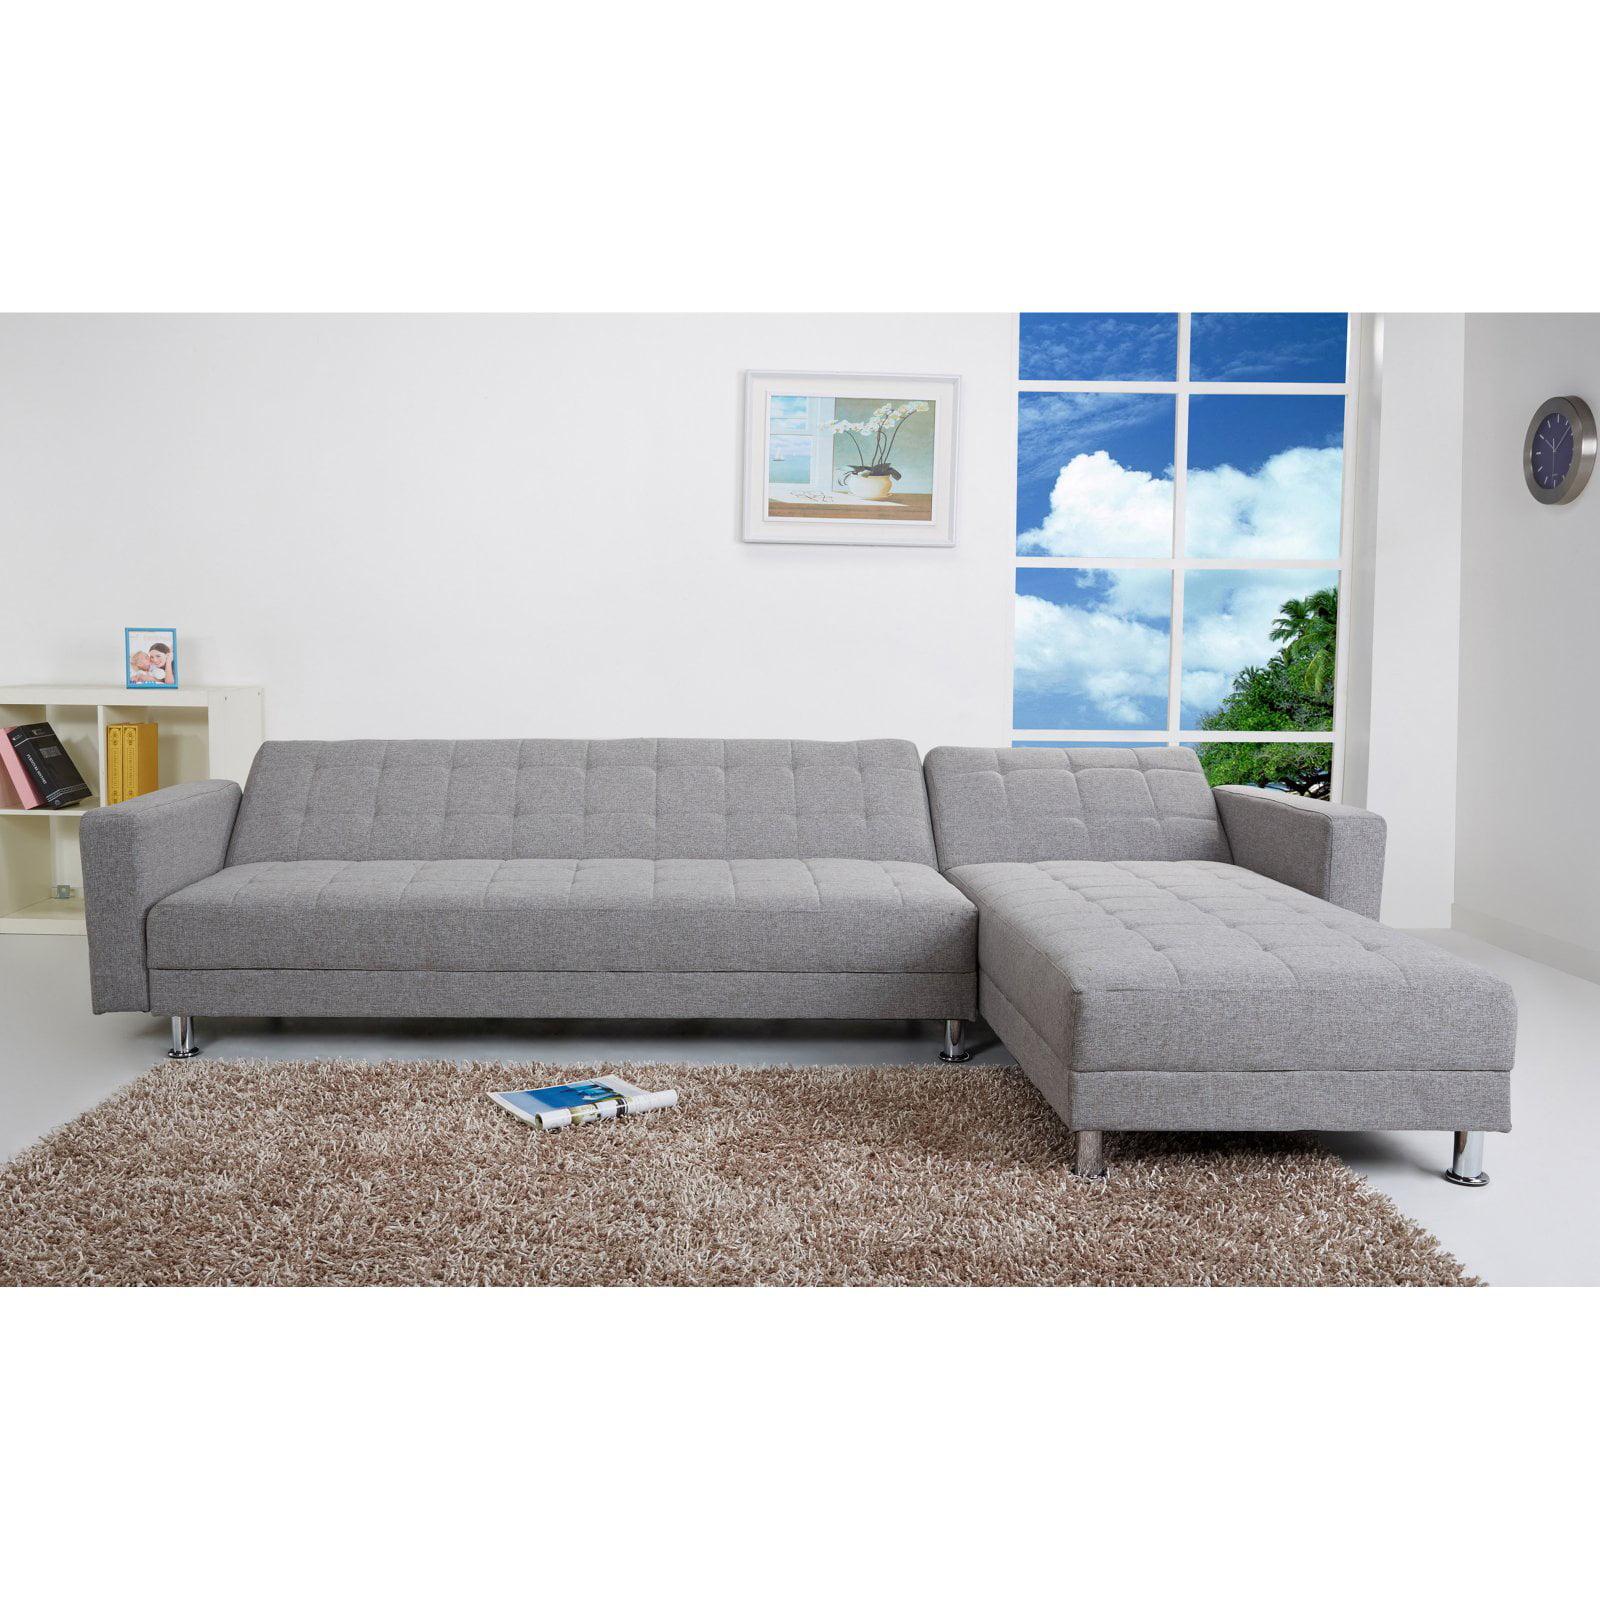 Gold Sparrow Frankfort Fabric Convertible Sectional Sofa Walmart Com